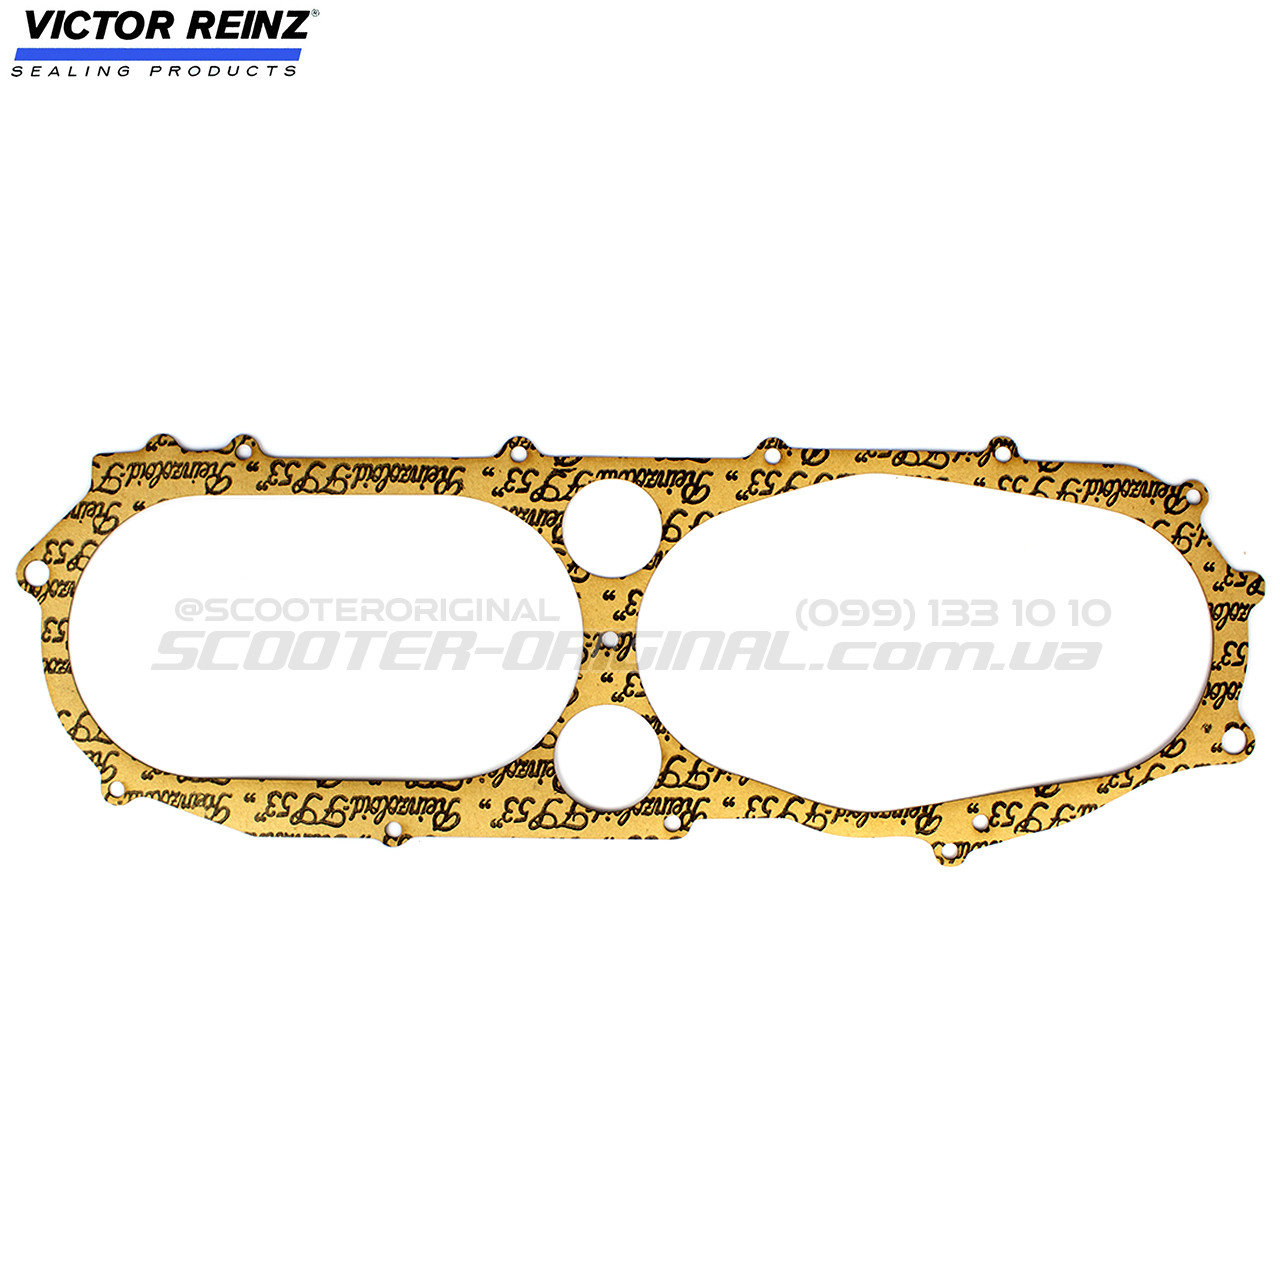 Прокладка кришки варіатора VICTOR REINZ Minarelli Vertical (CW)